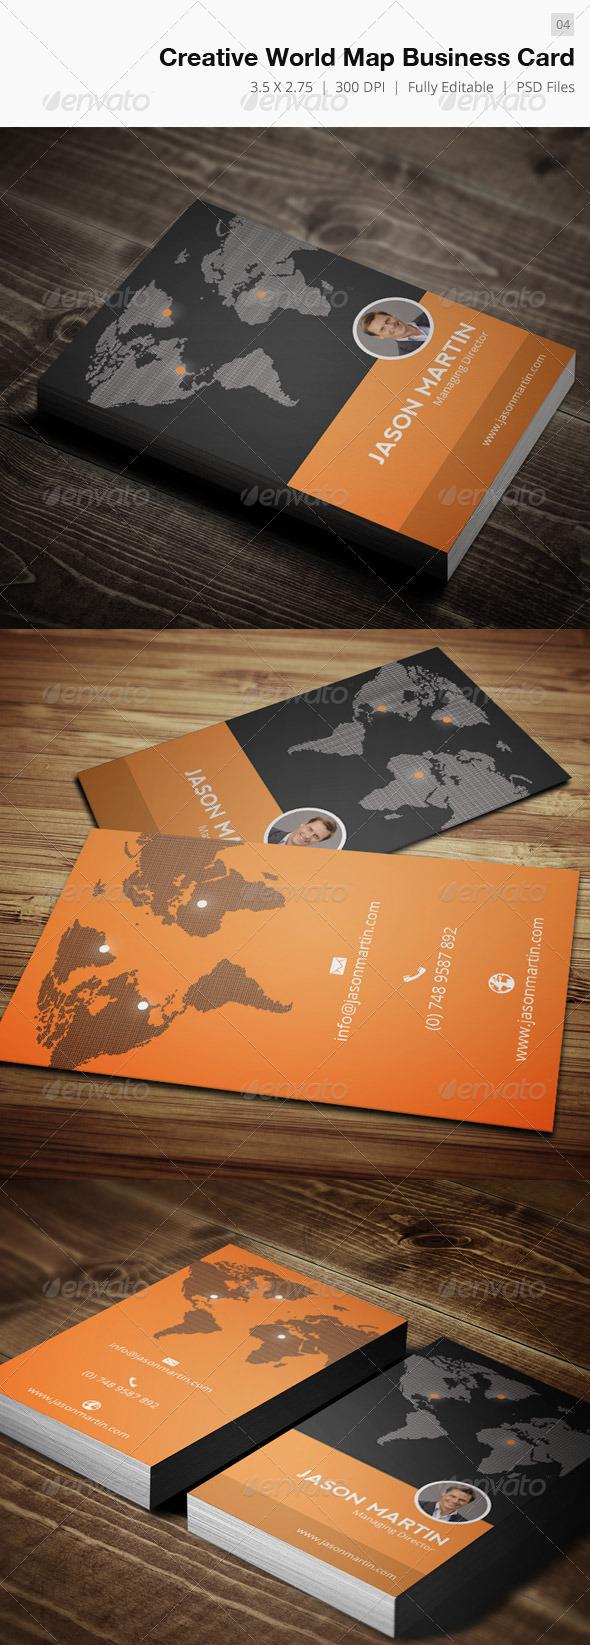 Creative World Map Business Card - 04 - Creative Business Cards